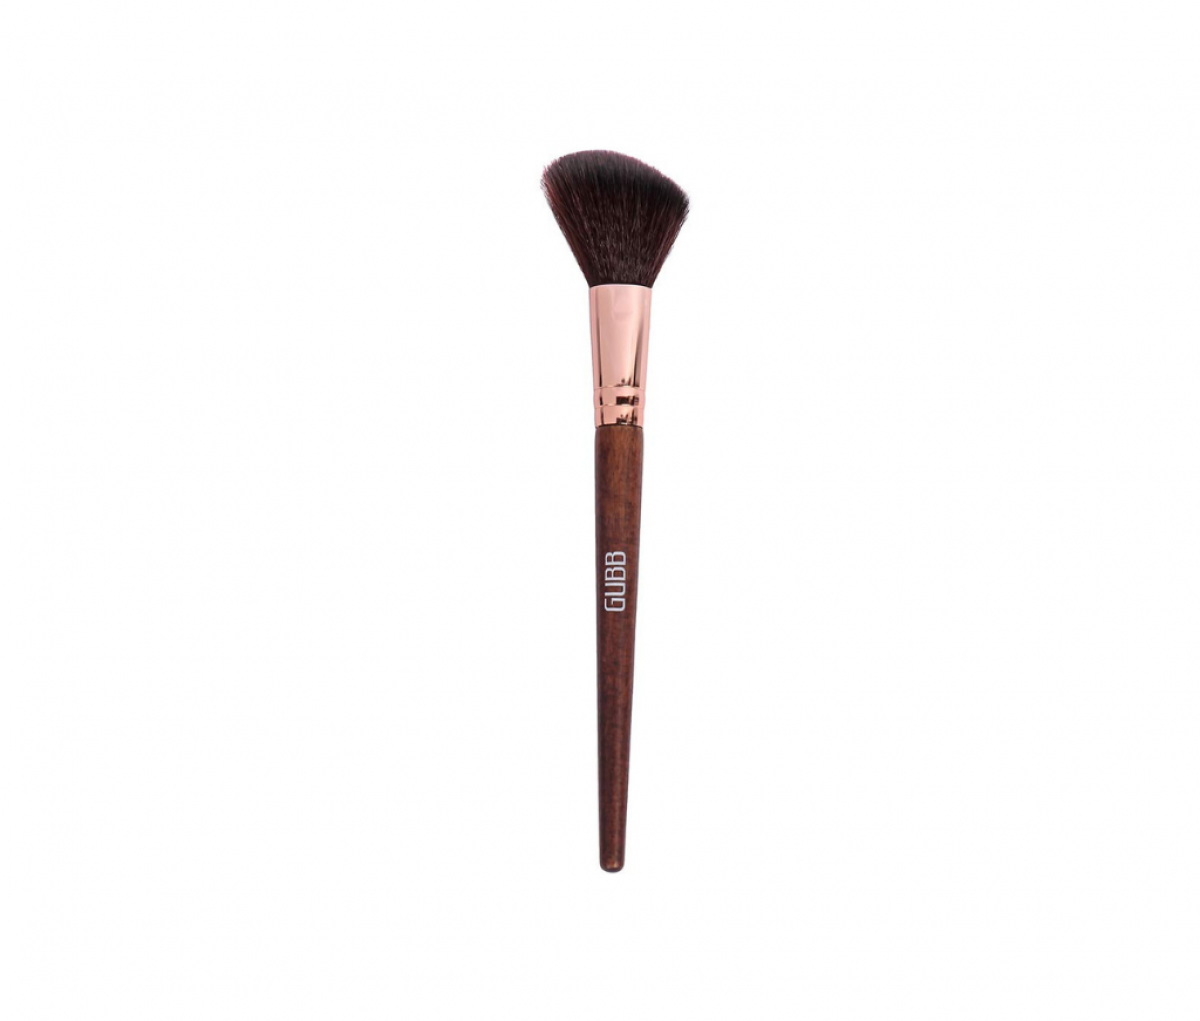 GUBB Make Up Brush Powder